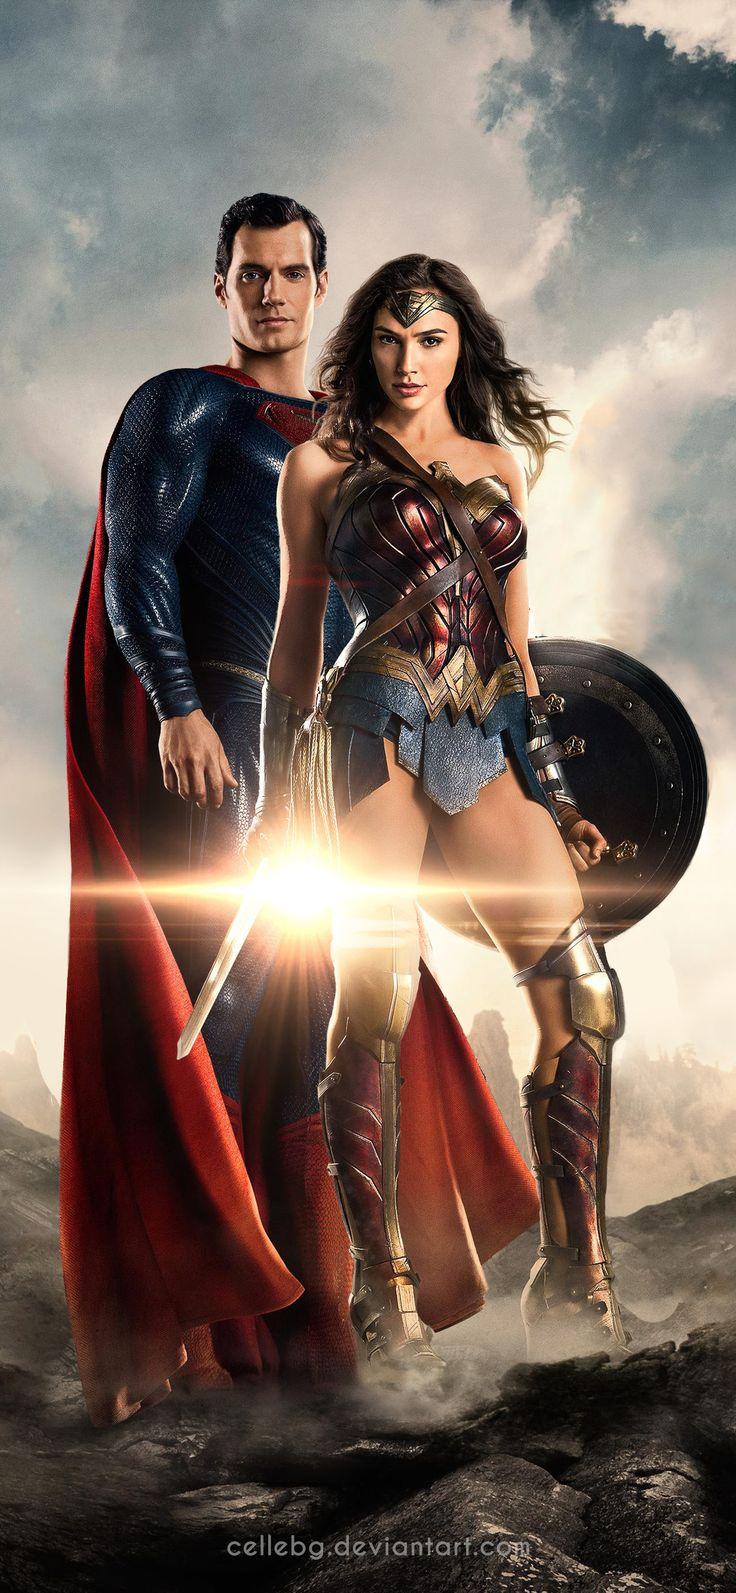 1125x2436 Justice League Superman Wonder Woman 4k Iphone